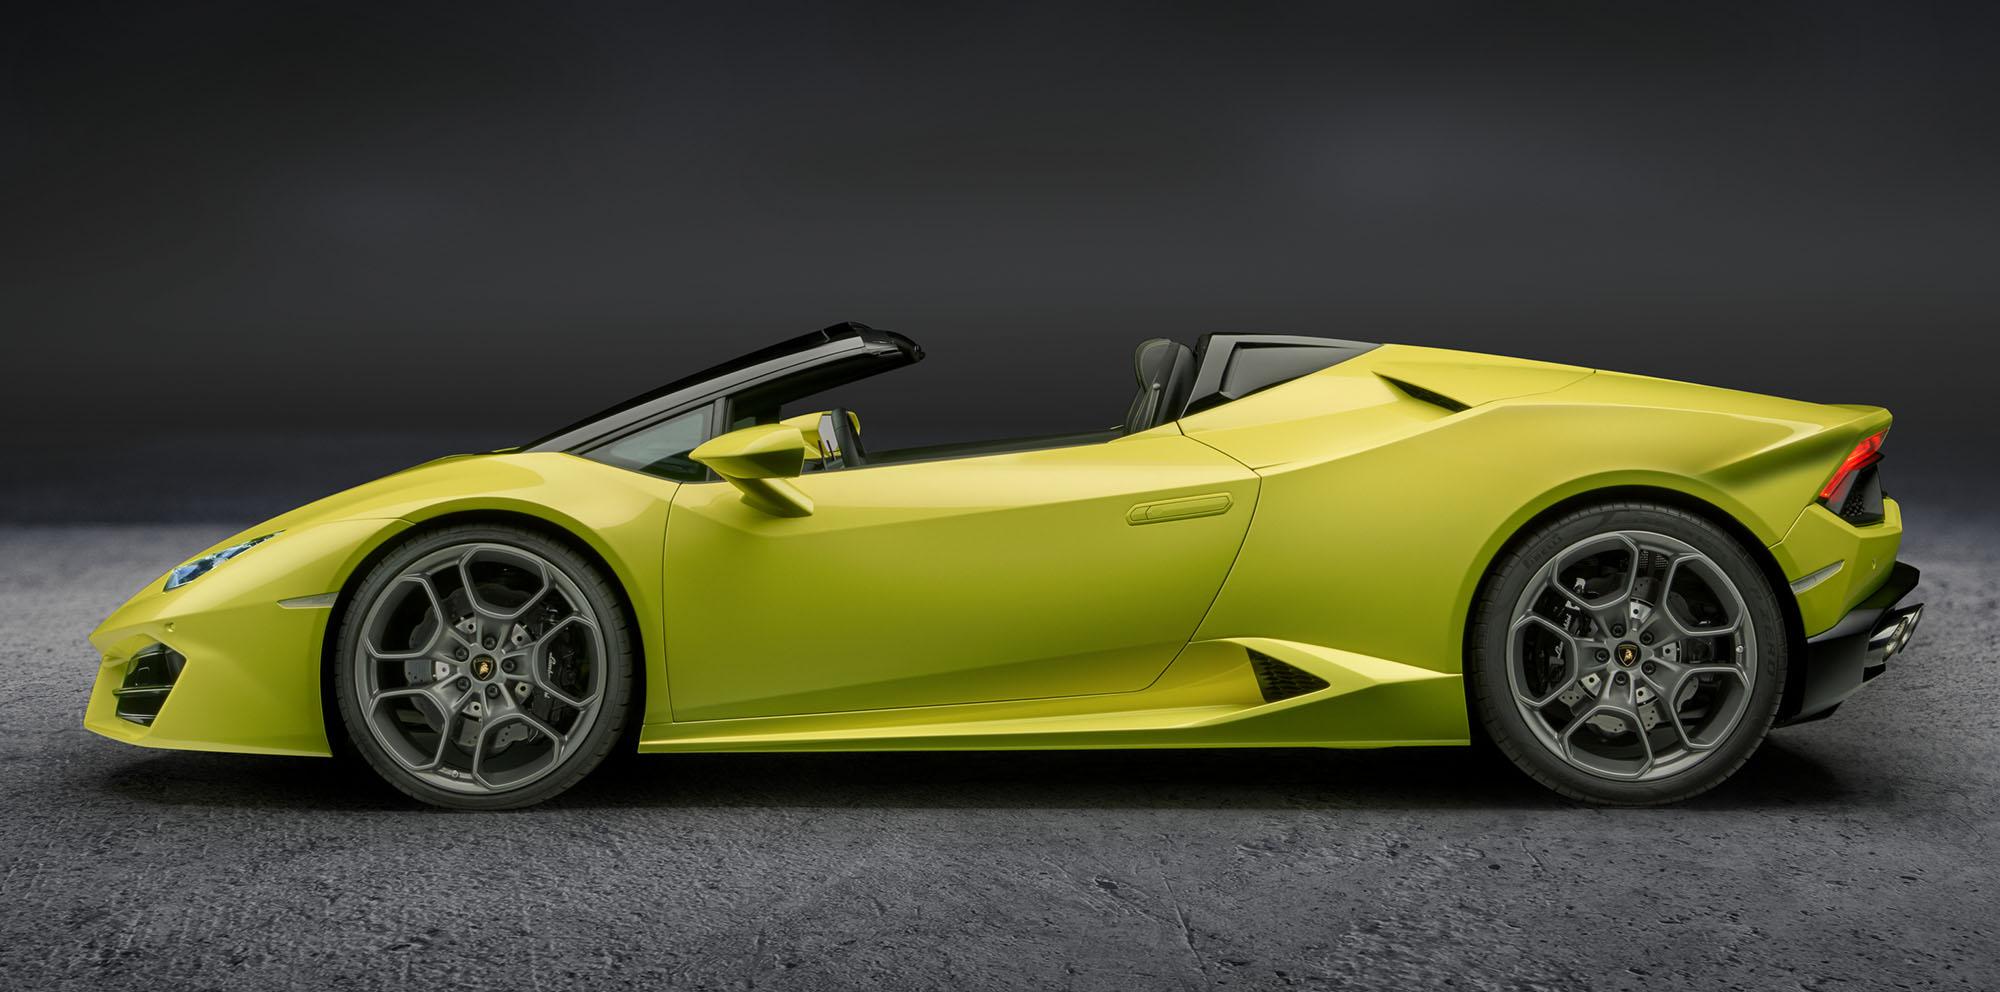 2017 Lamborghini Huracan Rear Wheel Drive Spyder Forever Mogul